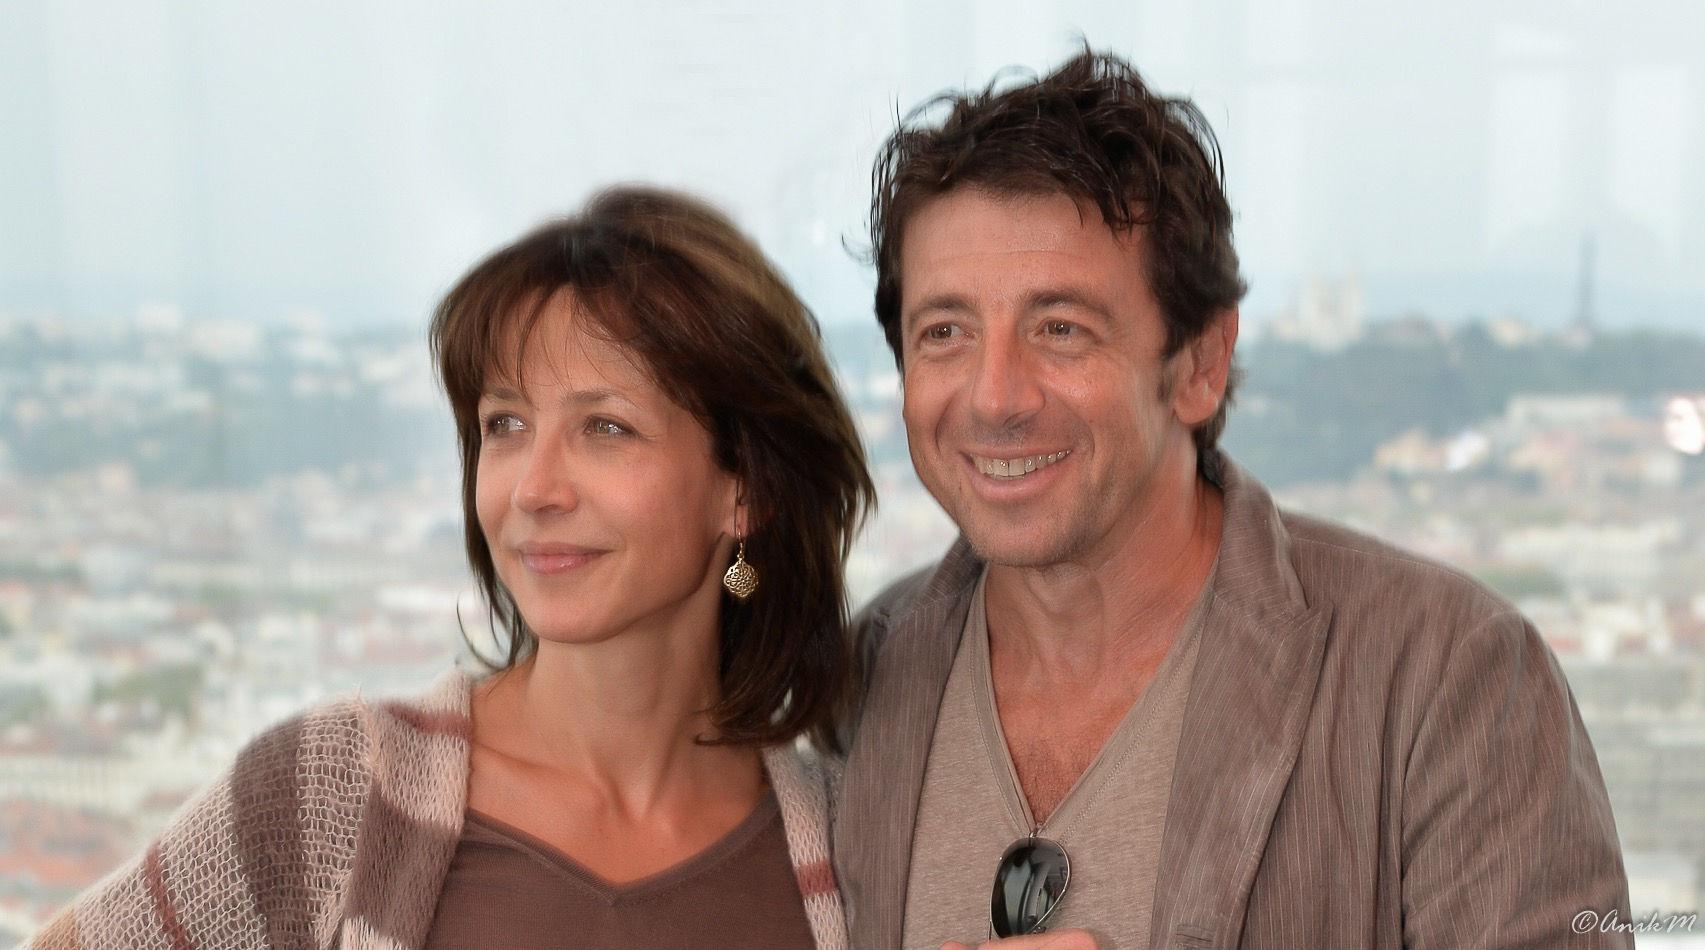 Sophie Marceau & Patrick Bruel